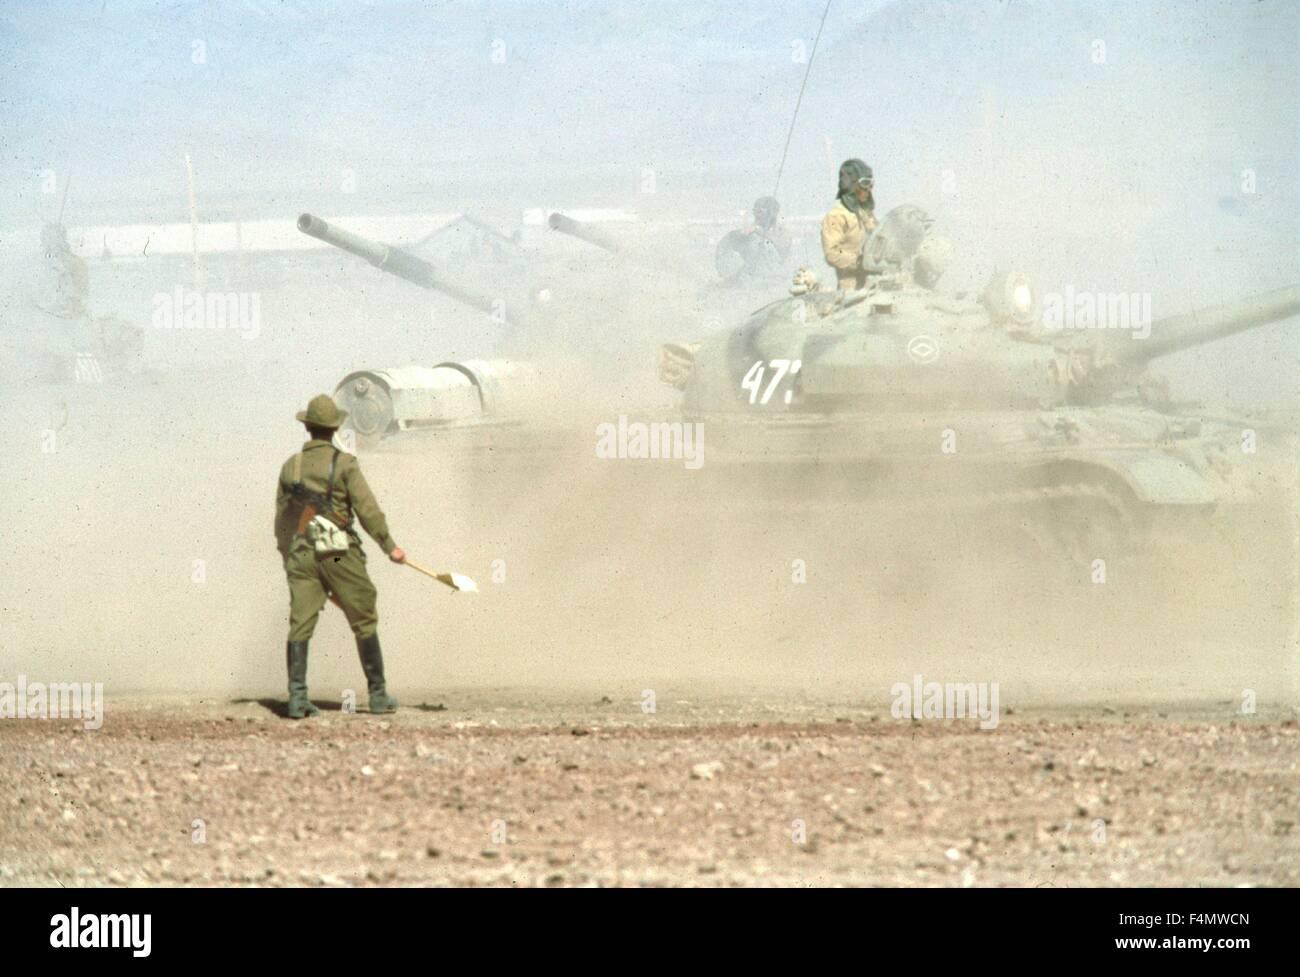 Soviet Afghanistan war - Page 6 Afghanistan-kandahar-1985-1986-F4MWCN